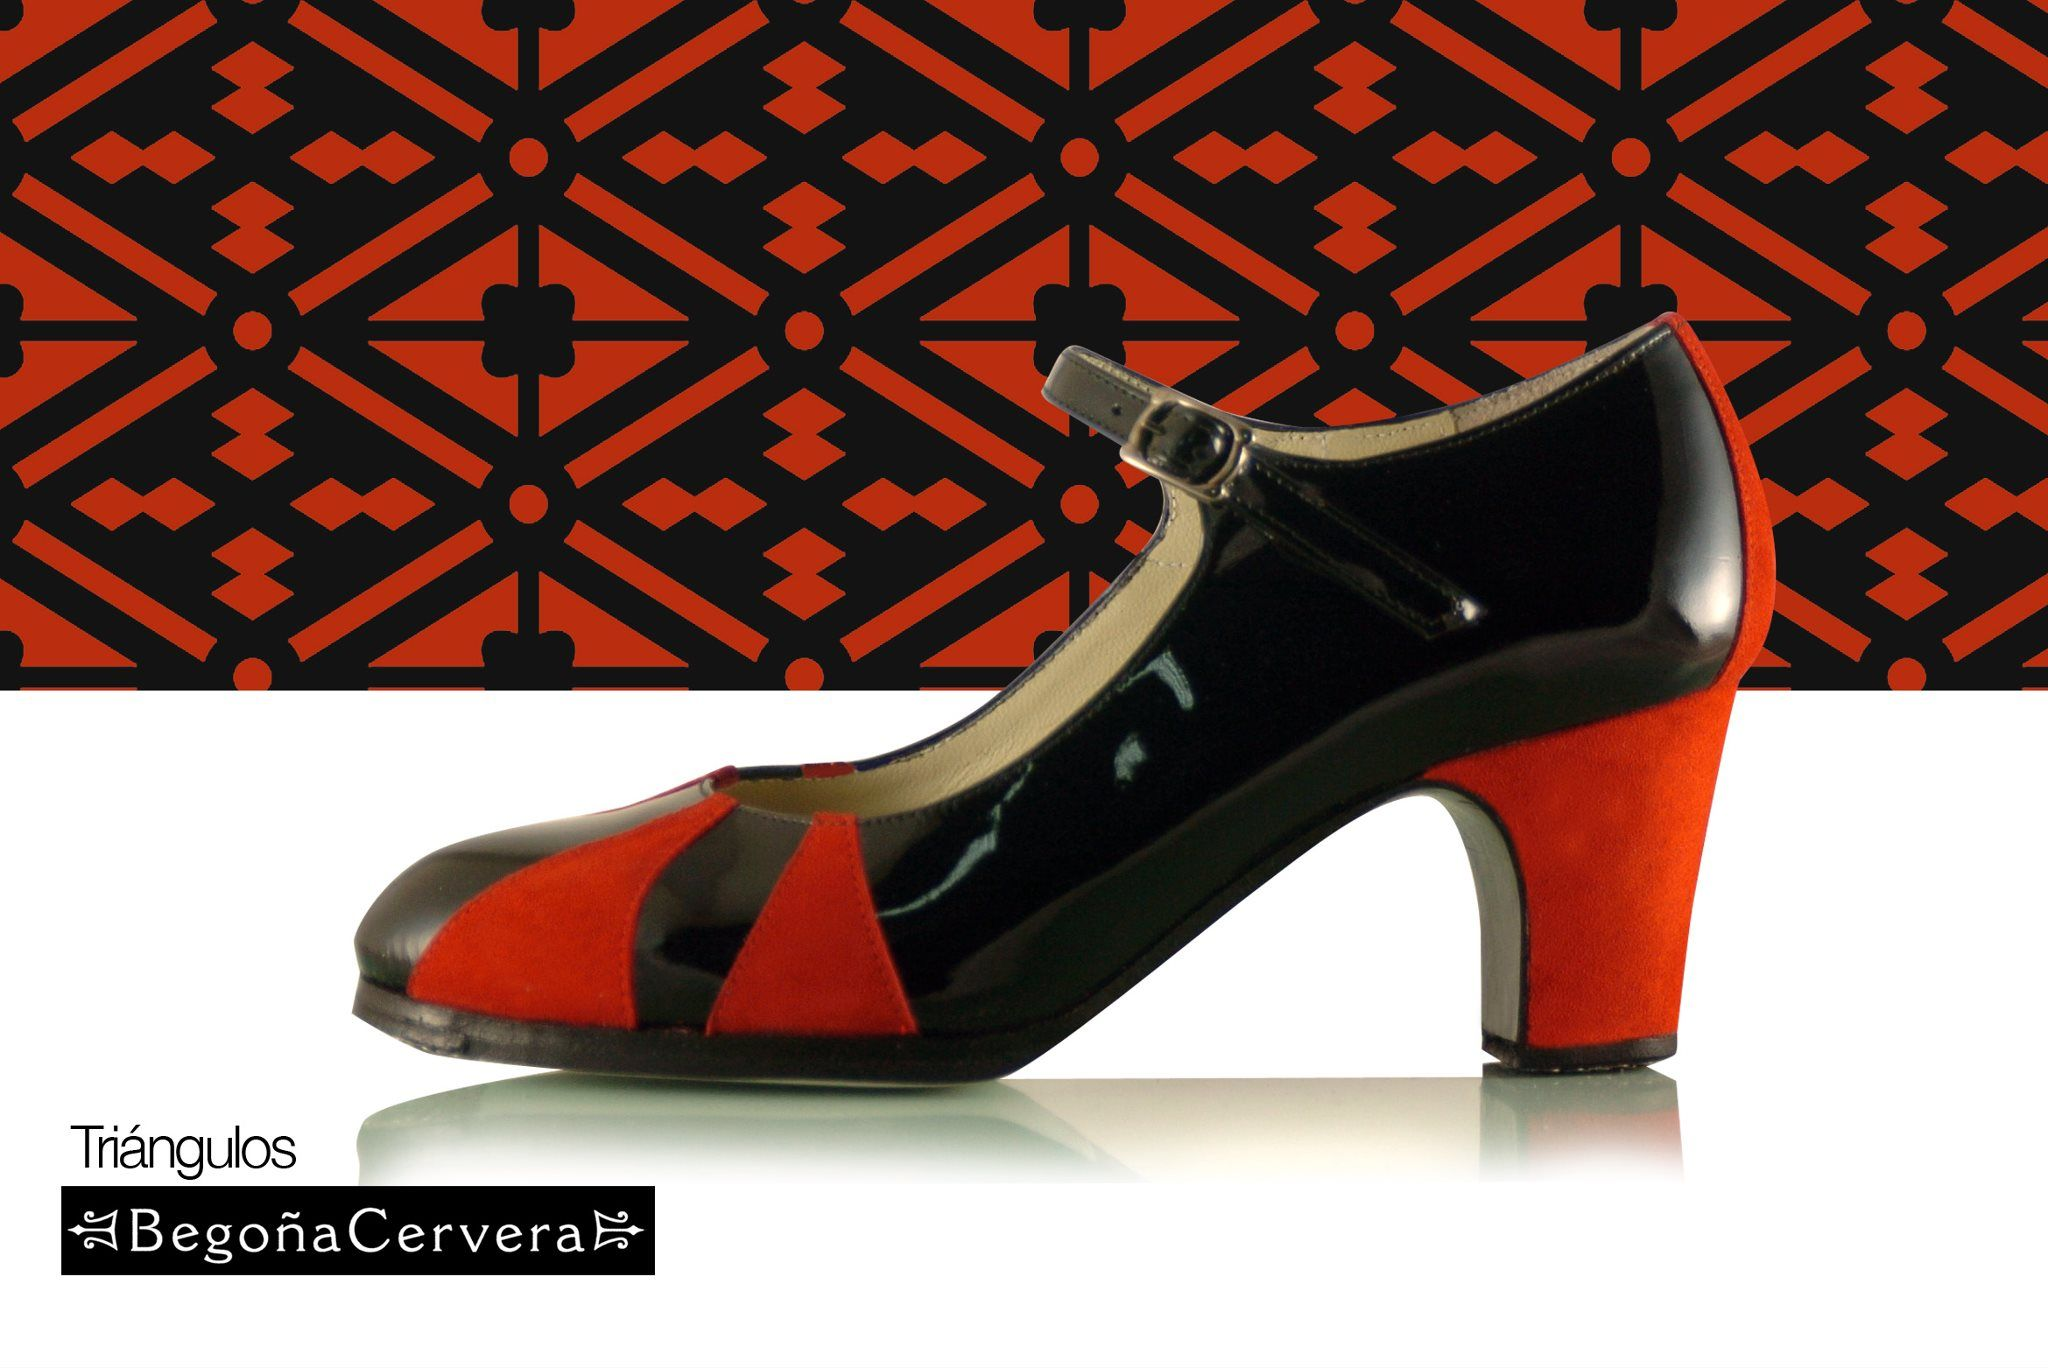 Zapato profesional de flamenco Begoña Cervera Modelo Trangulos charol negro